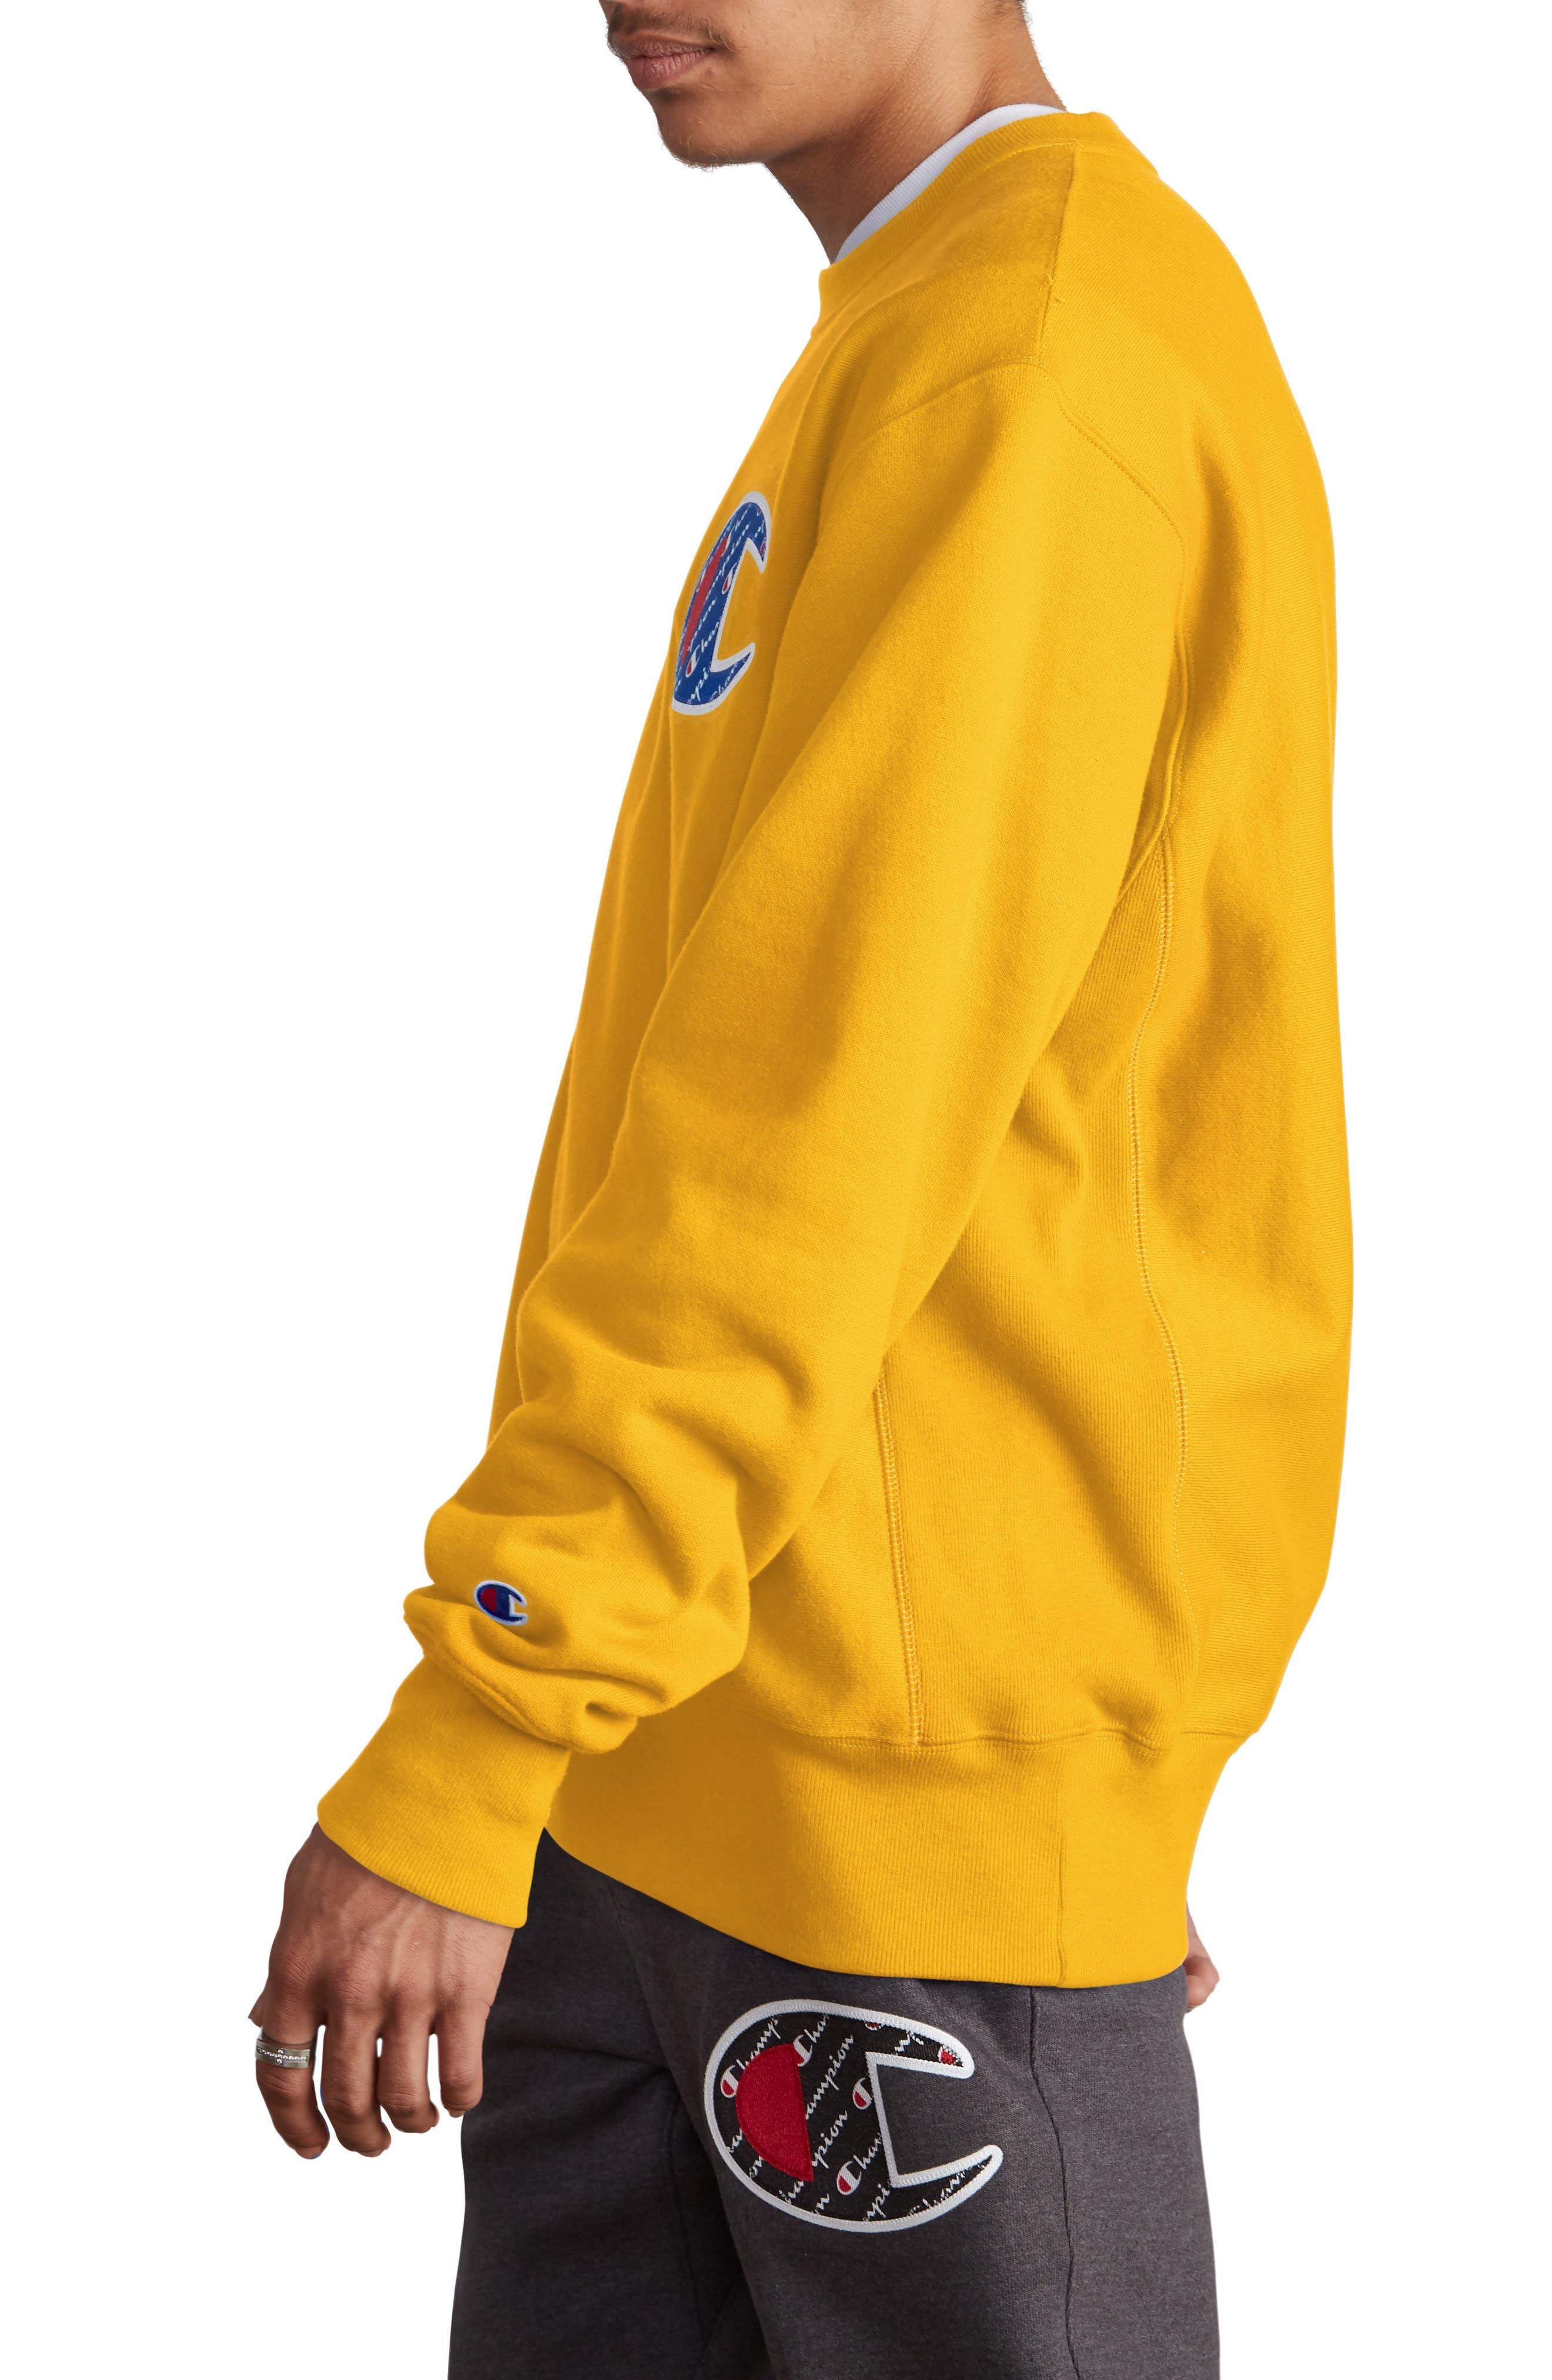 Sublimated Logo Crewneck Sweatshirt,                             Alternate thumbnail 3, color,                             CHAMPION GOLD